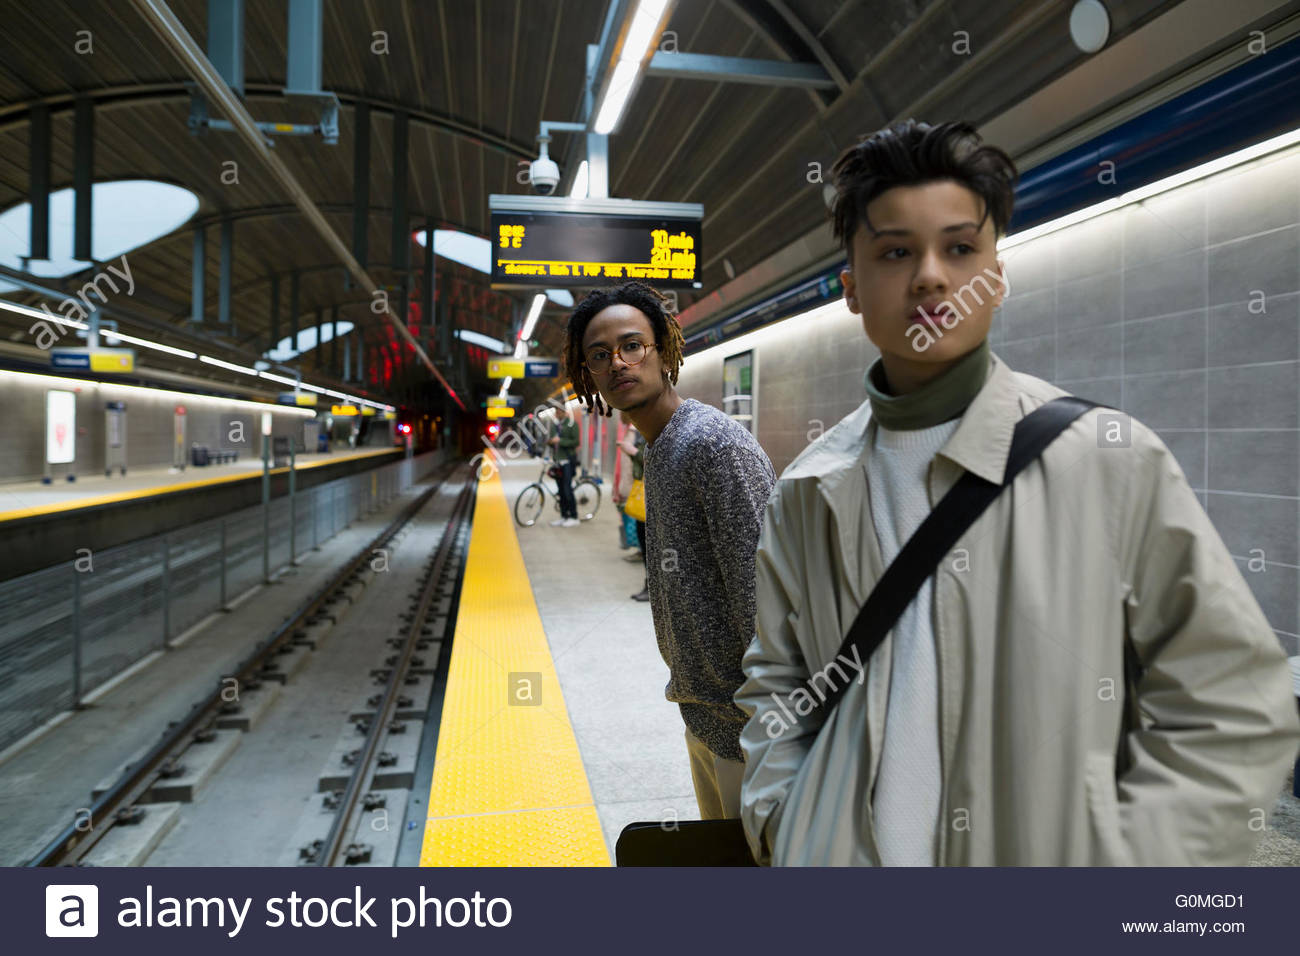 Young men waiting on subway station platform - Stock Image